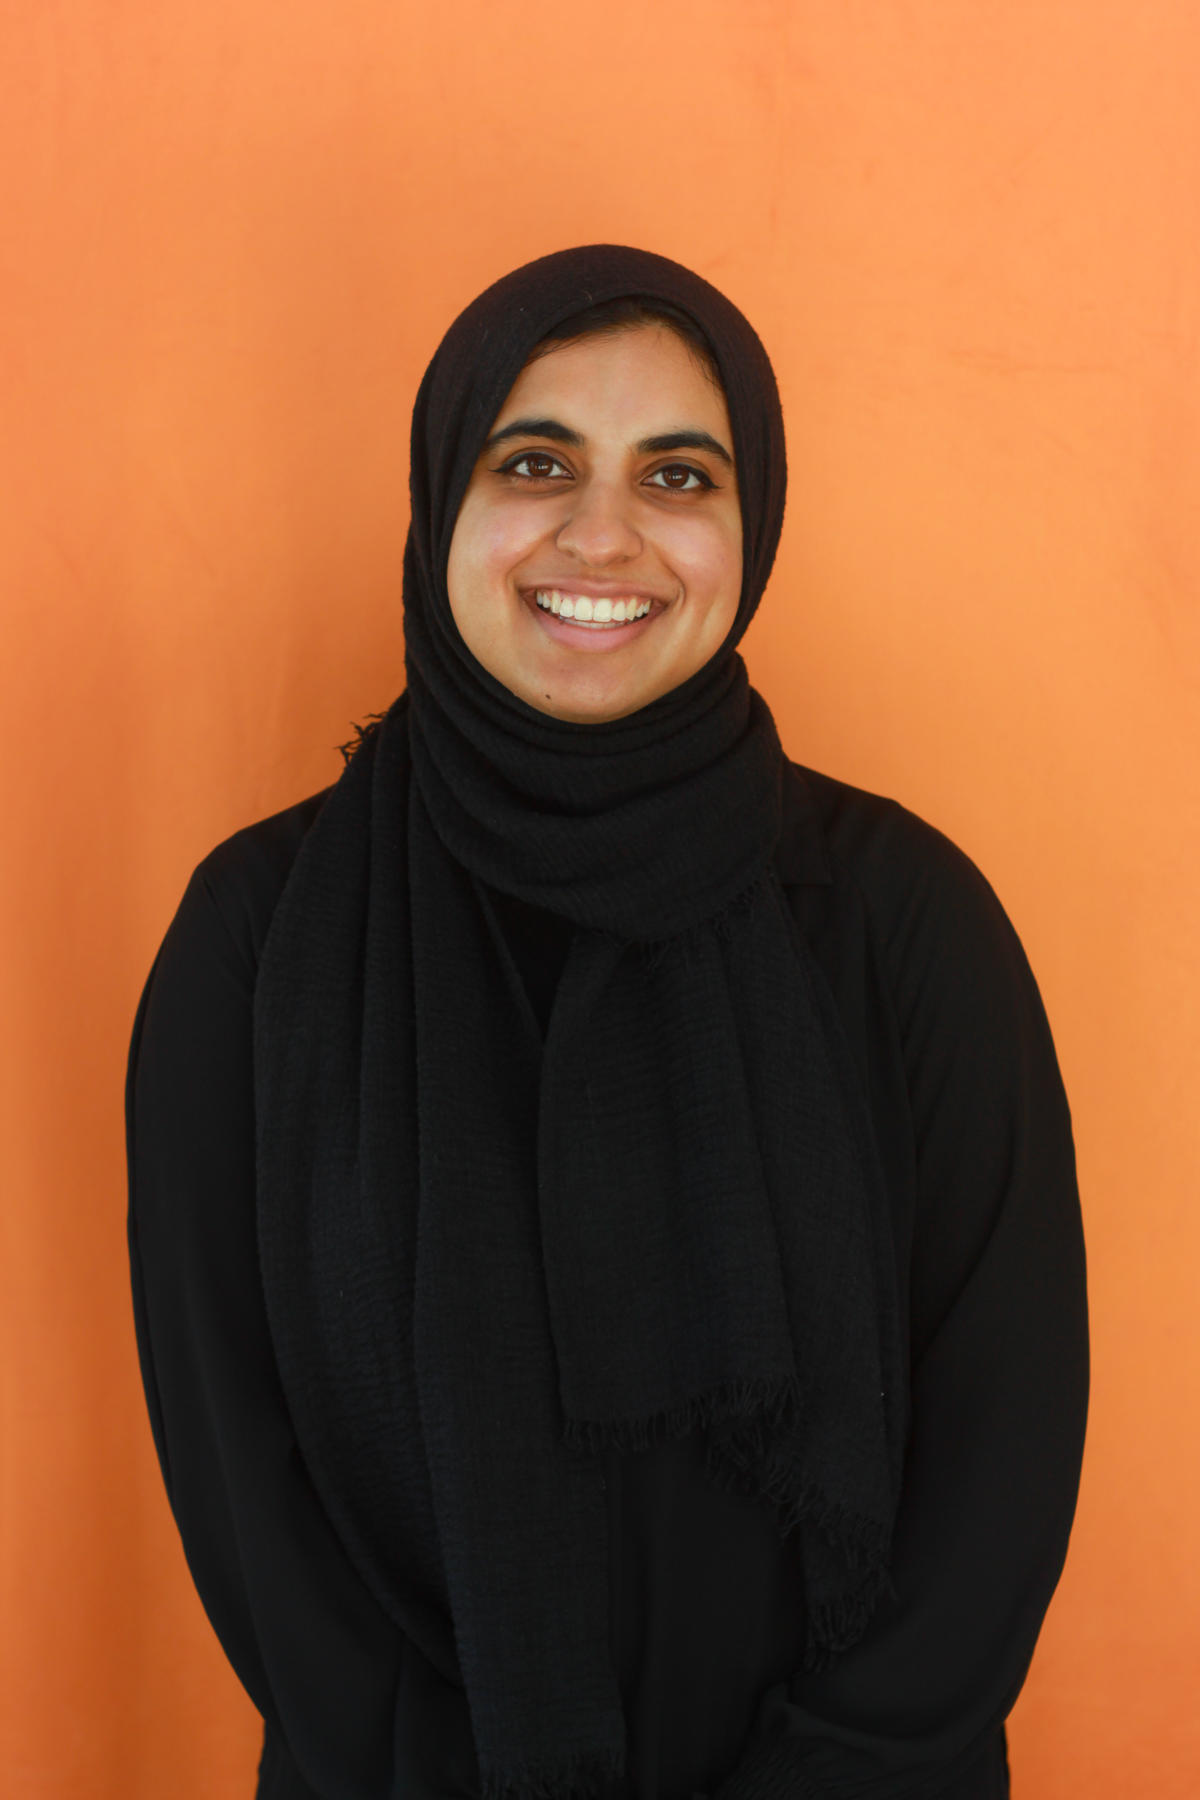 Anisa Chaudhry